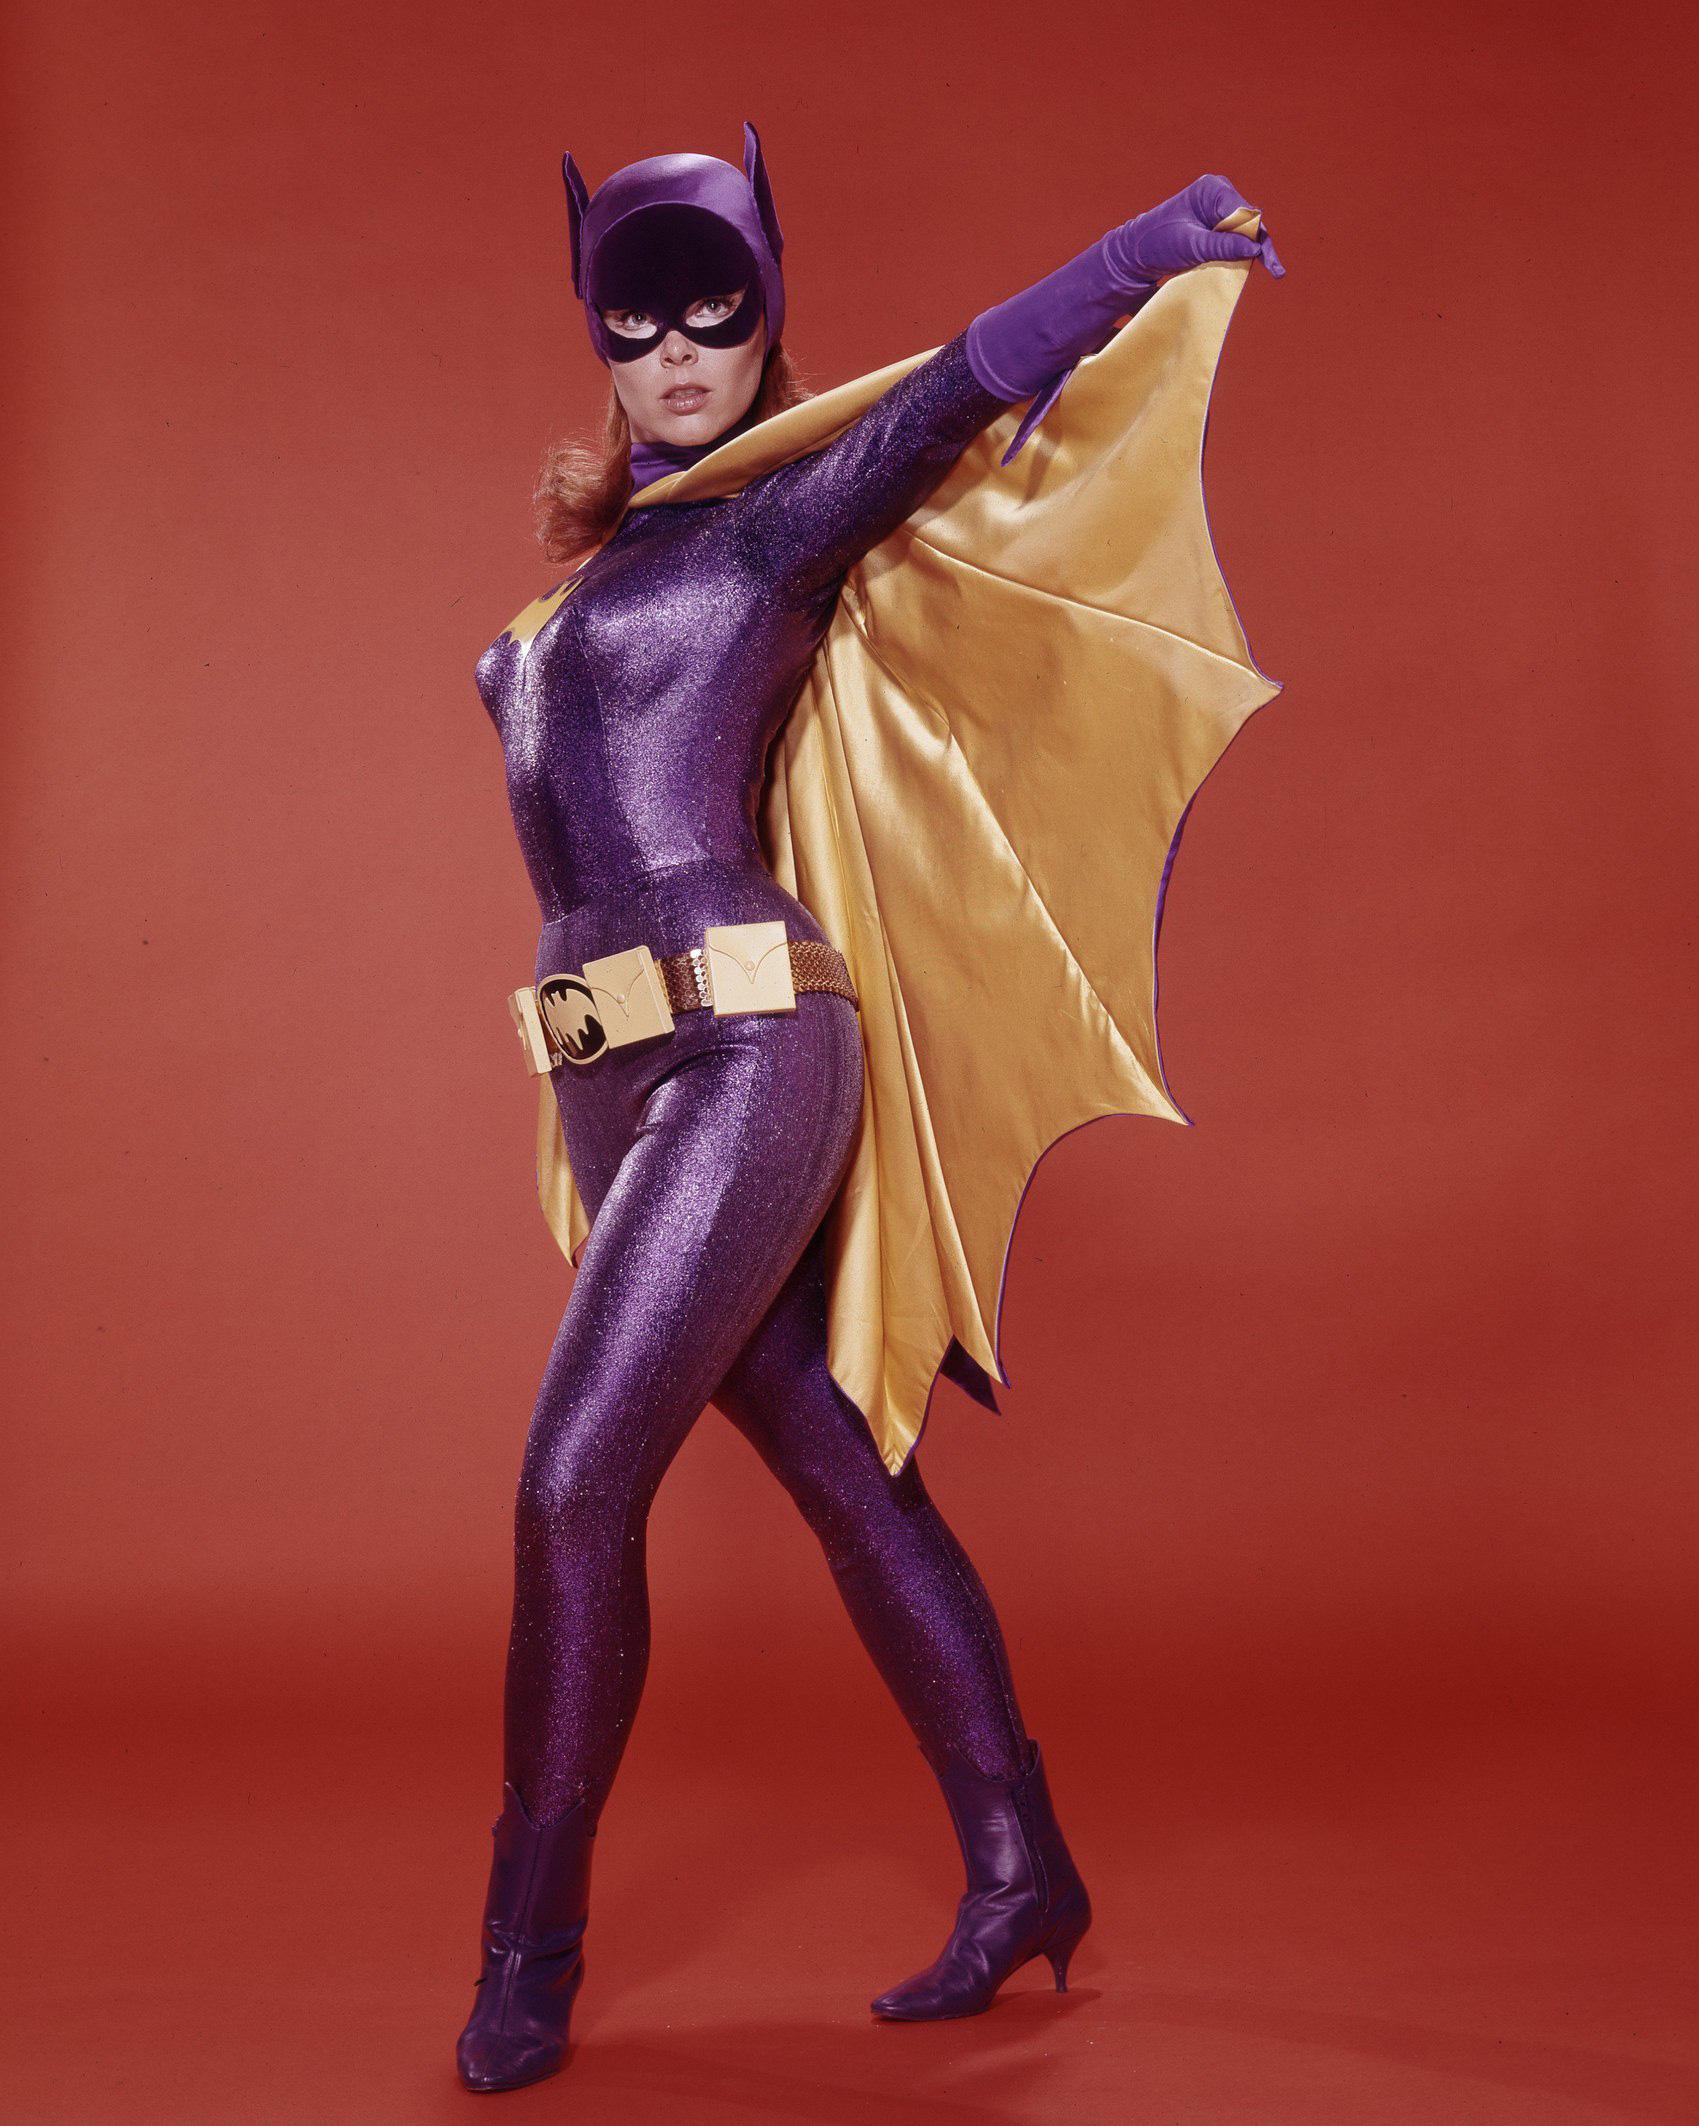 Barbara Gordon (Batman 1966 TV Series)